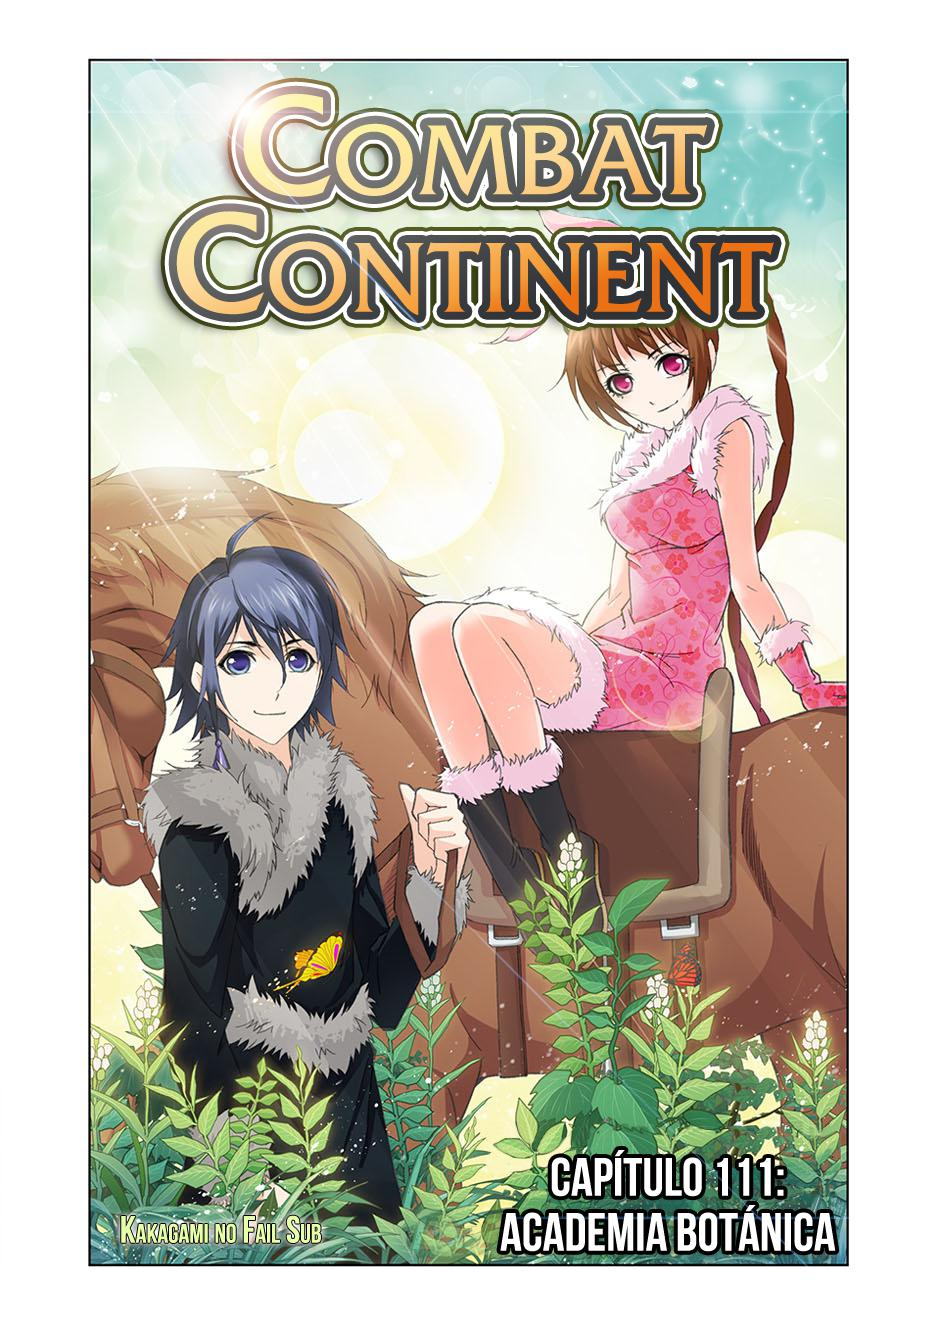 https://c5.mangatag.com/es_manga/18/16210/417007/f7ddba6262b801bc2aae351a3b30851a.jpg Page 2